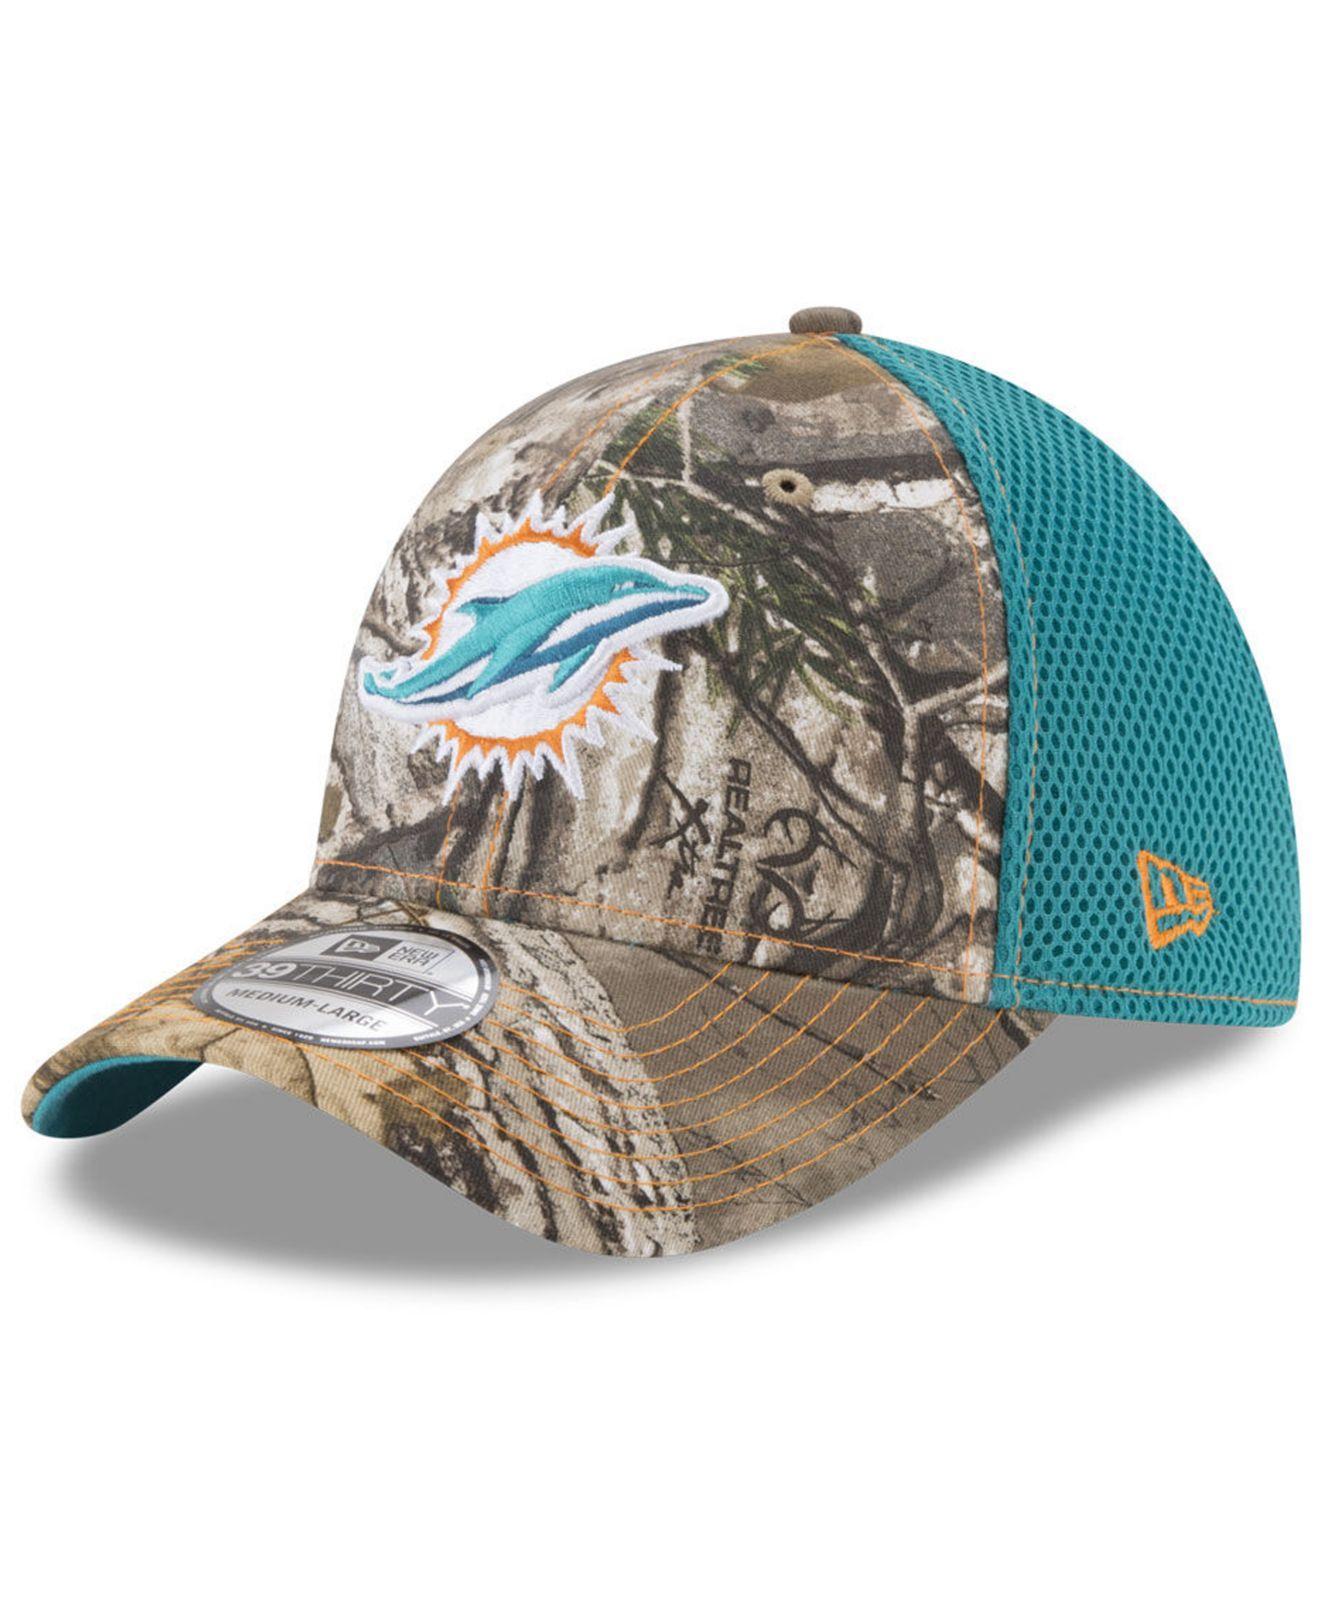 Lyst - Ktz Miami Dolphins Realtree Camo Team Color Neo 39thirty Cap ... caba5671a